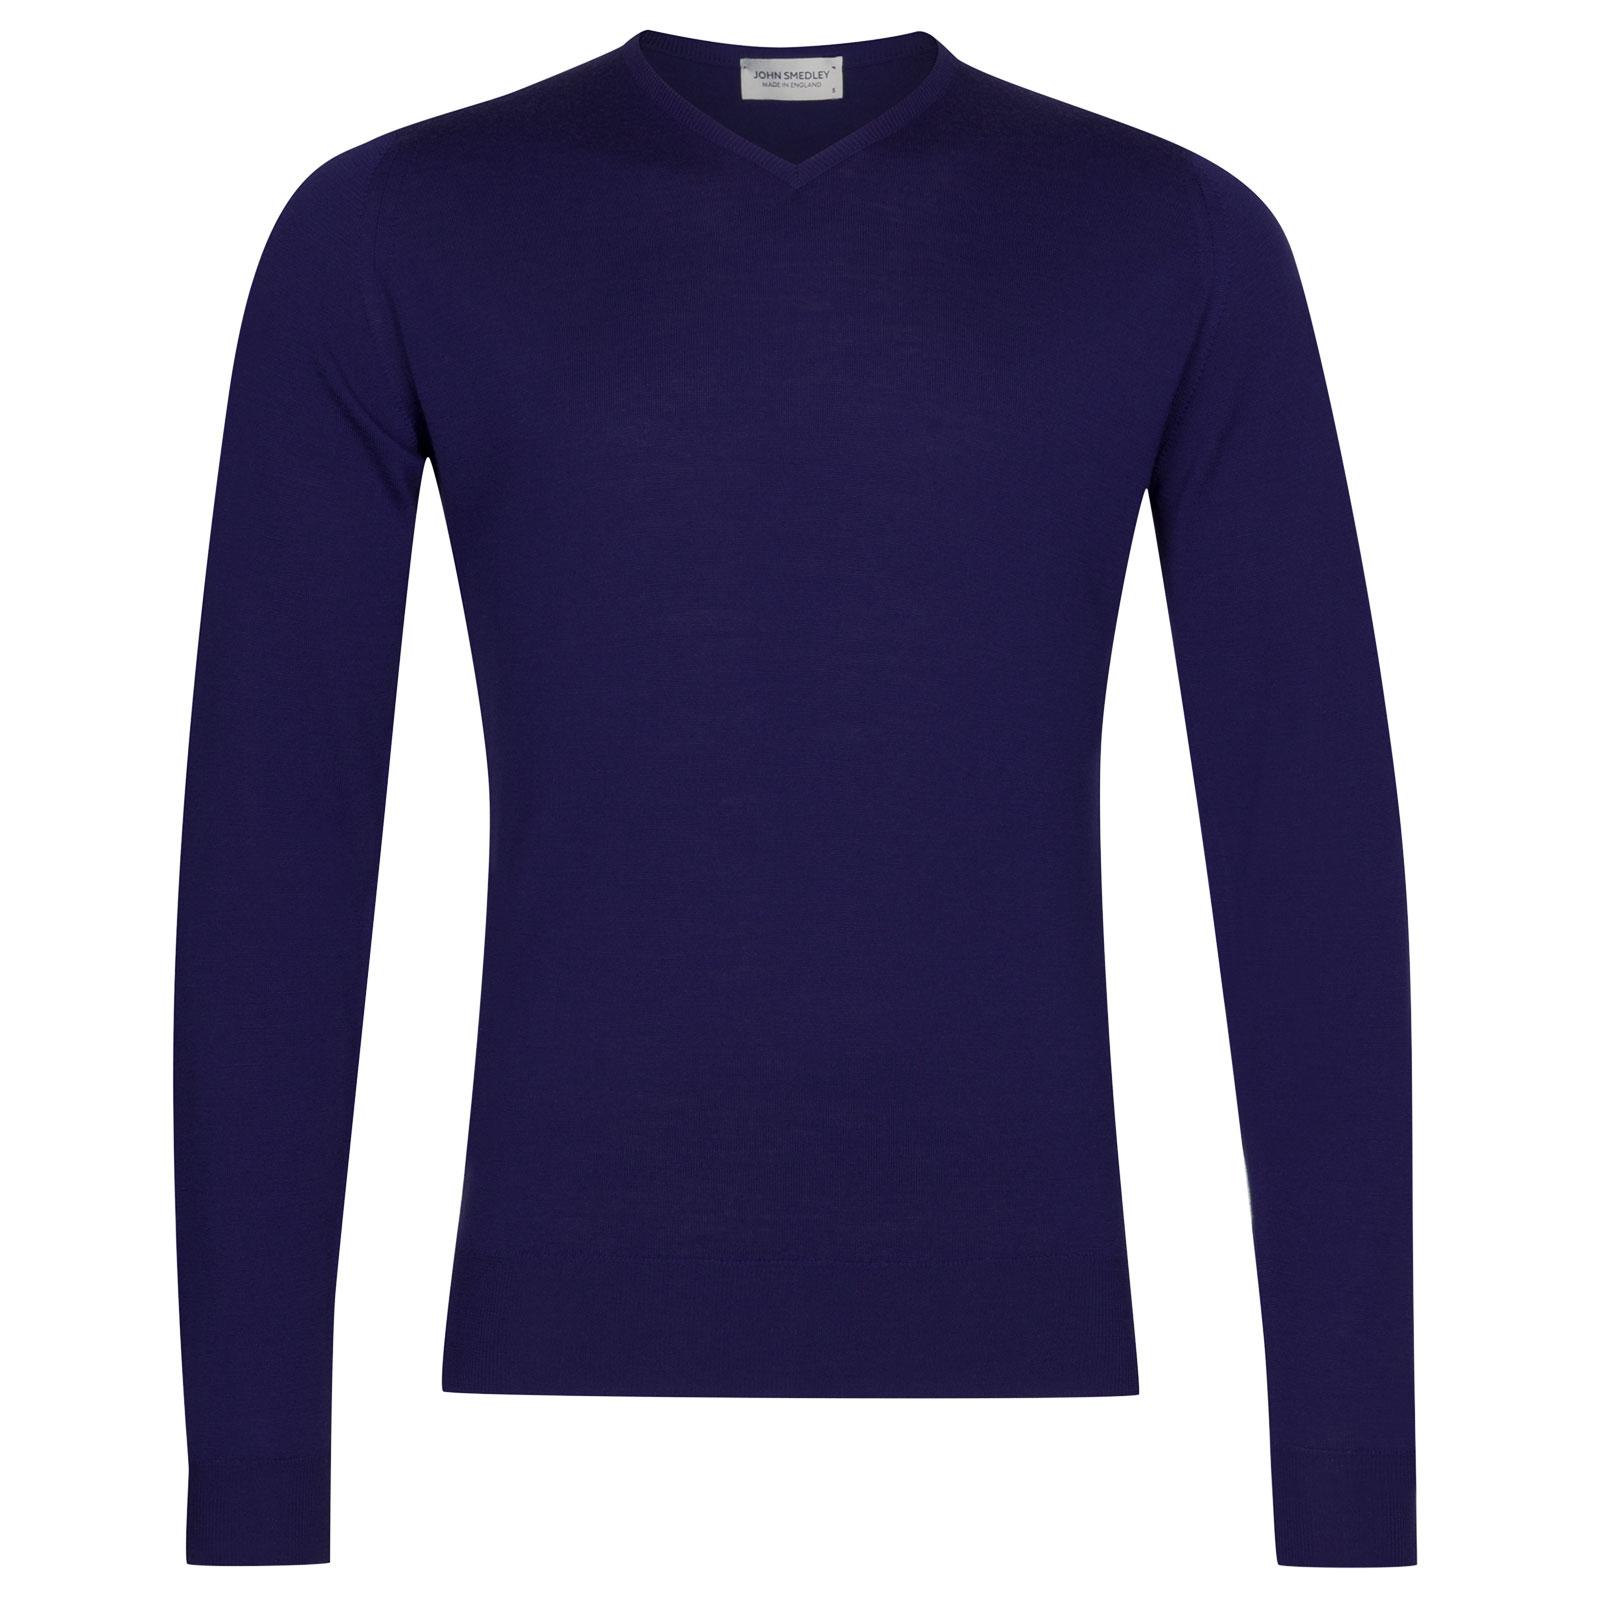 John Smedley Shipton Merino Wool Pullover in Serge Blue-M